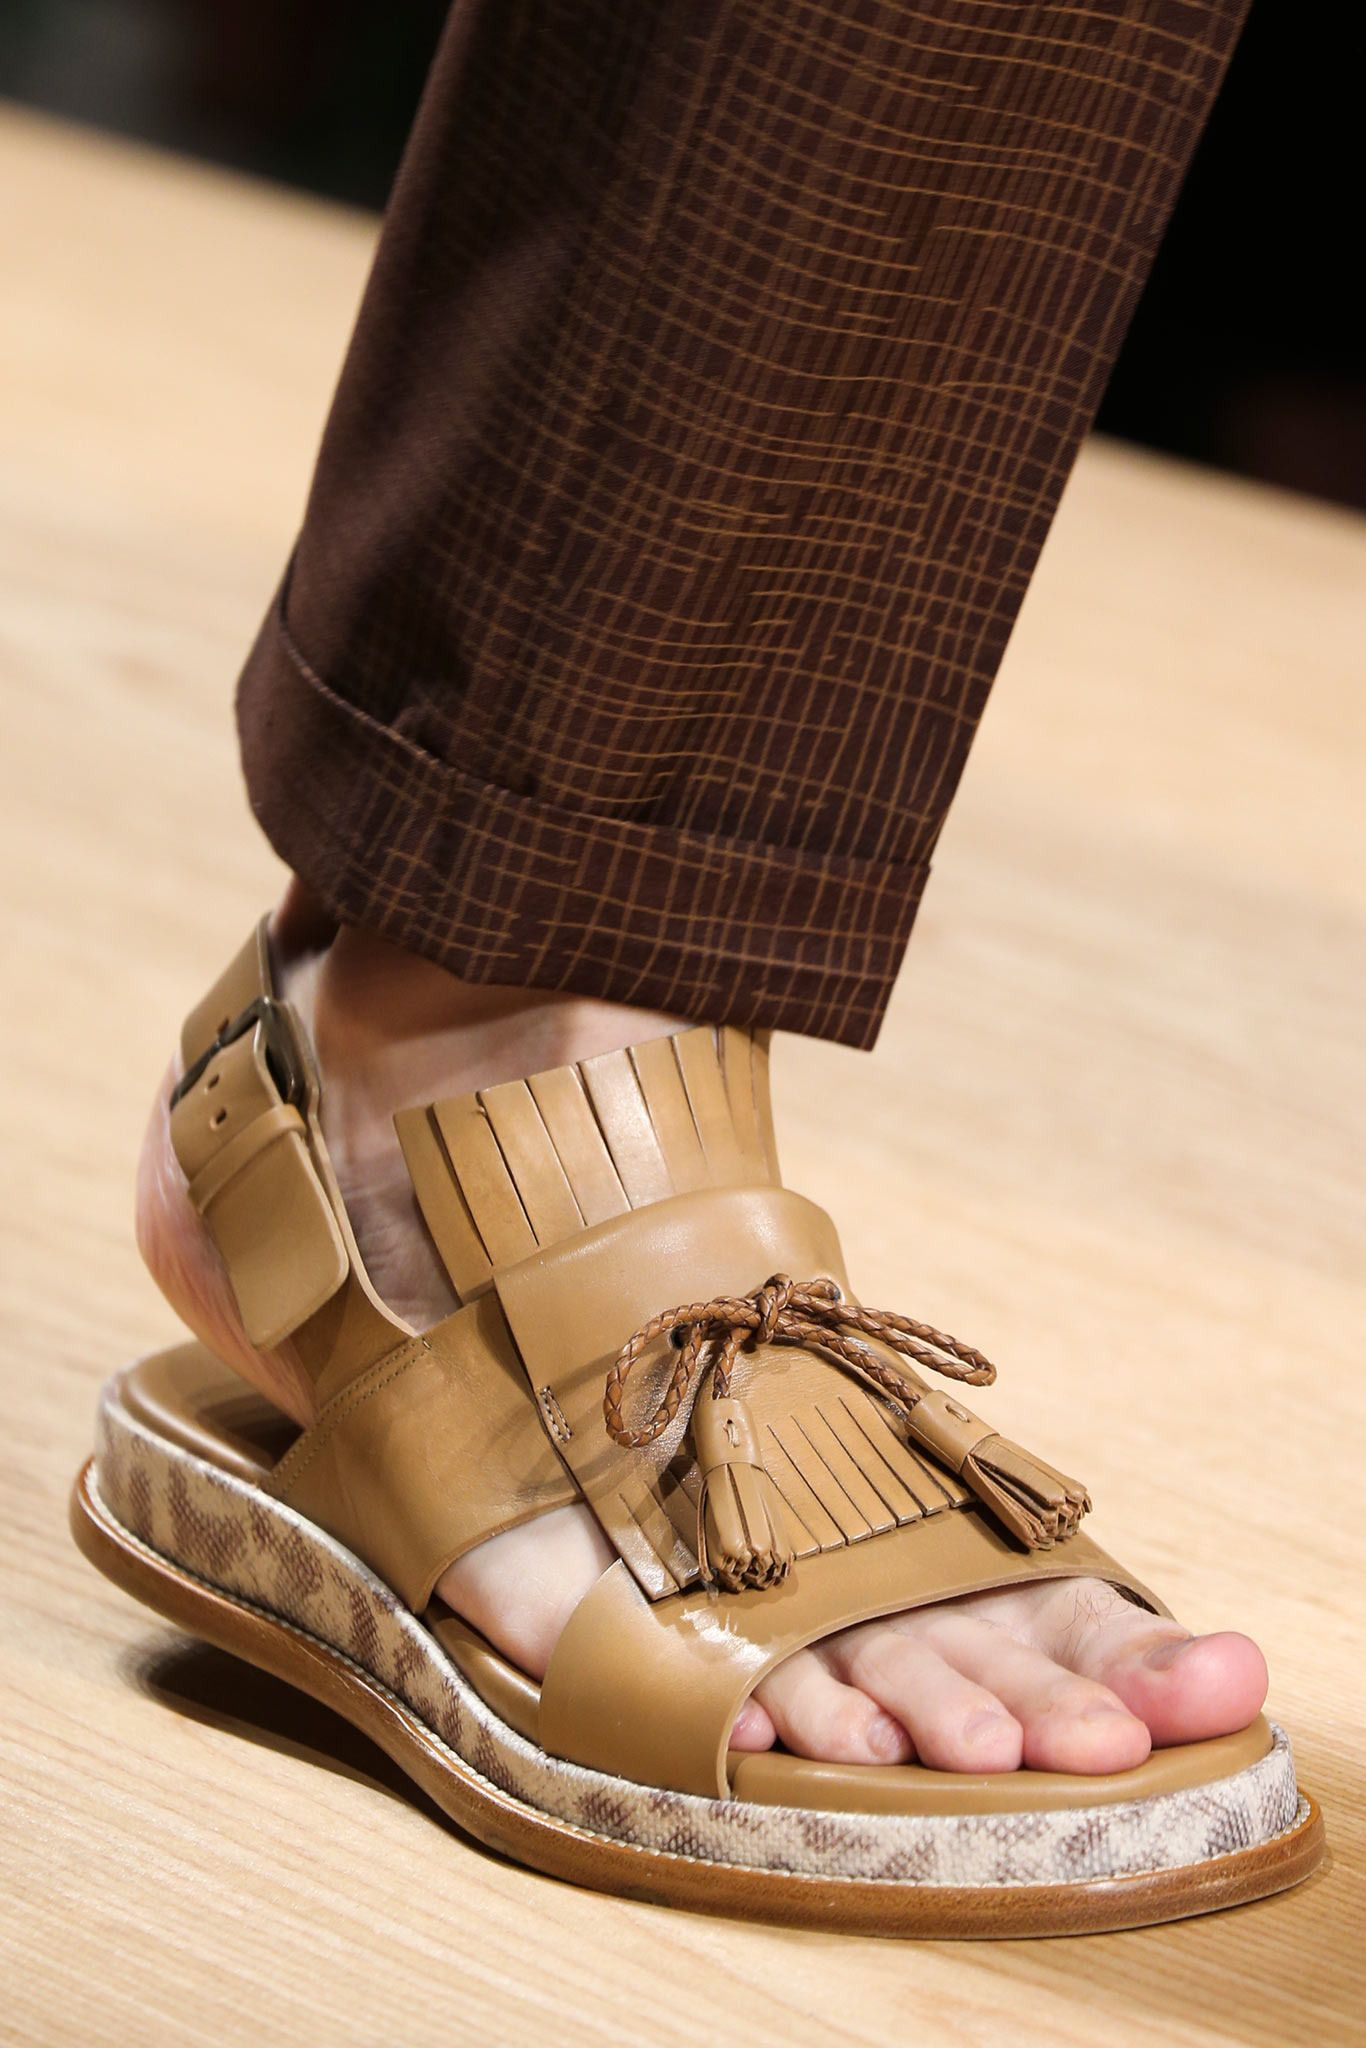 Menswear Shoes Ferragamo Salvatore Pinterest 2015 Spring Men g1S00qUw